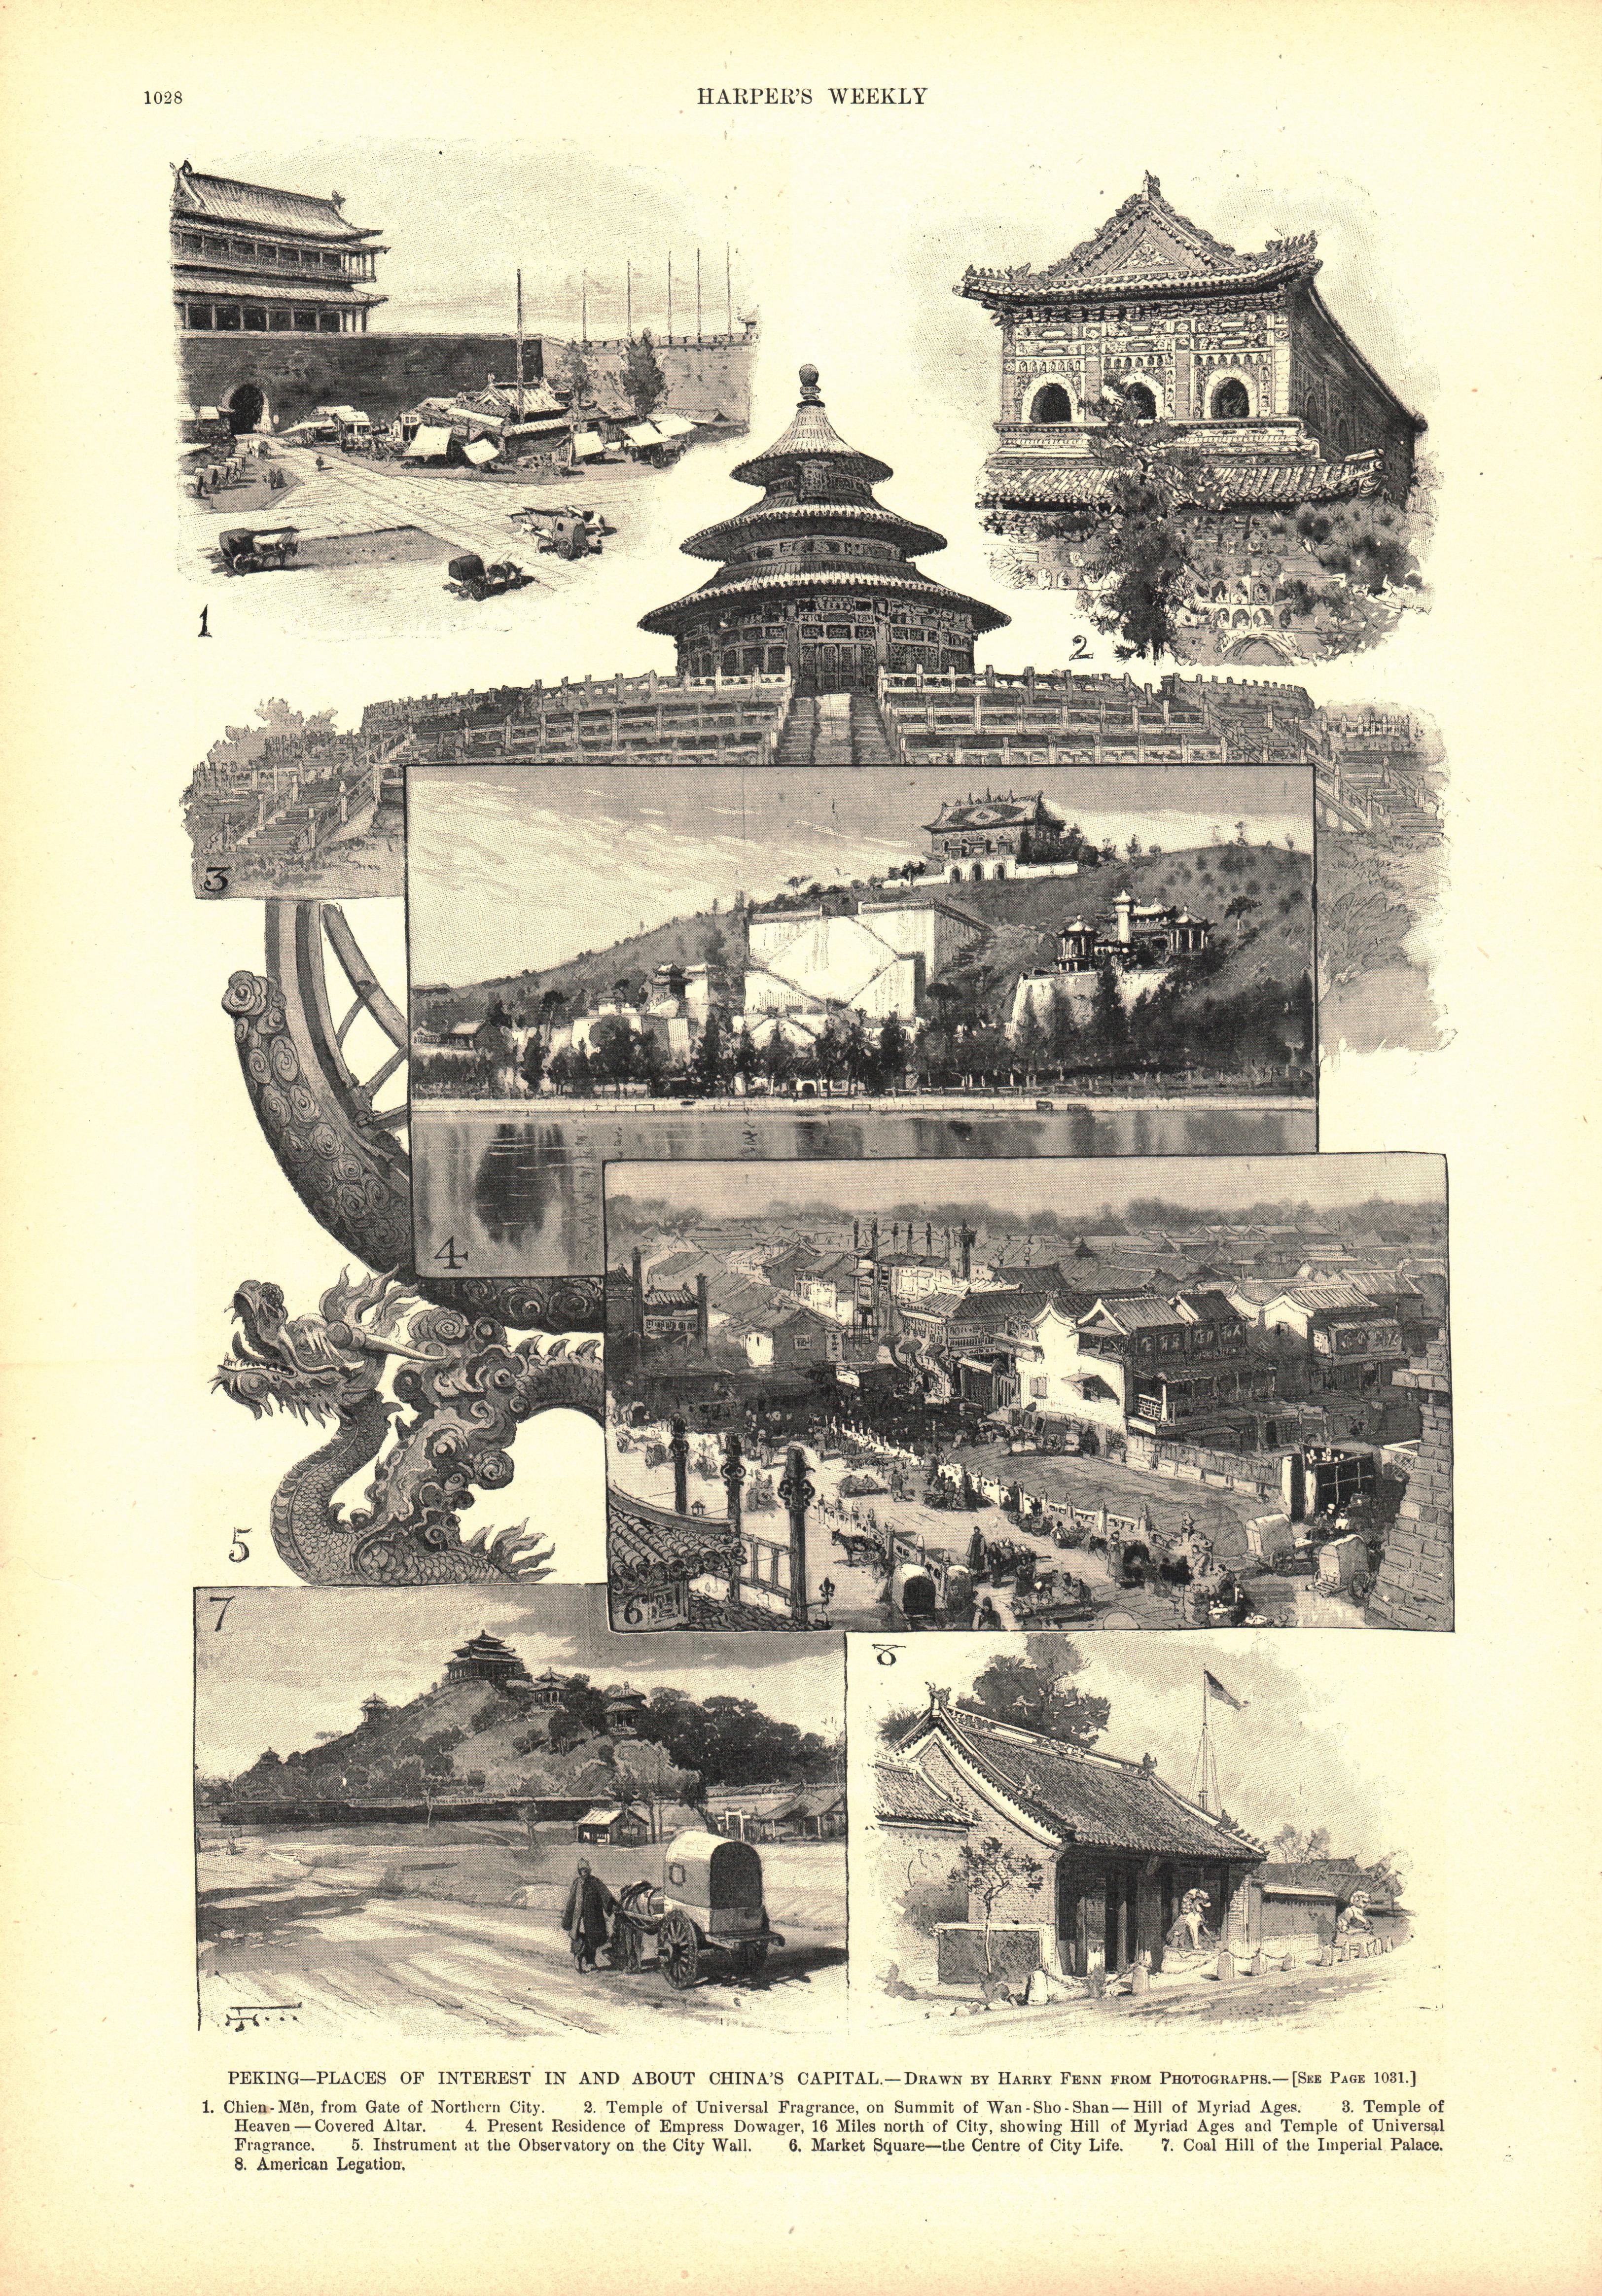 Peking-Places of